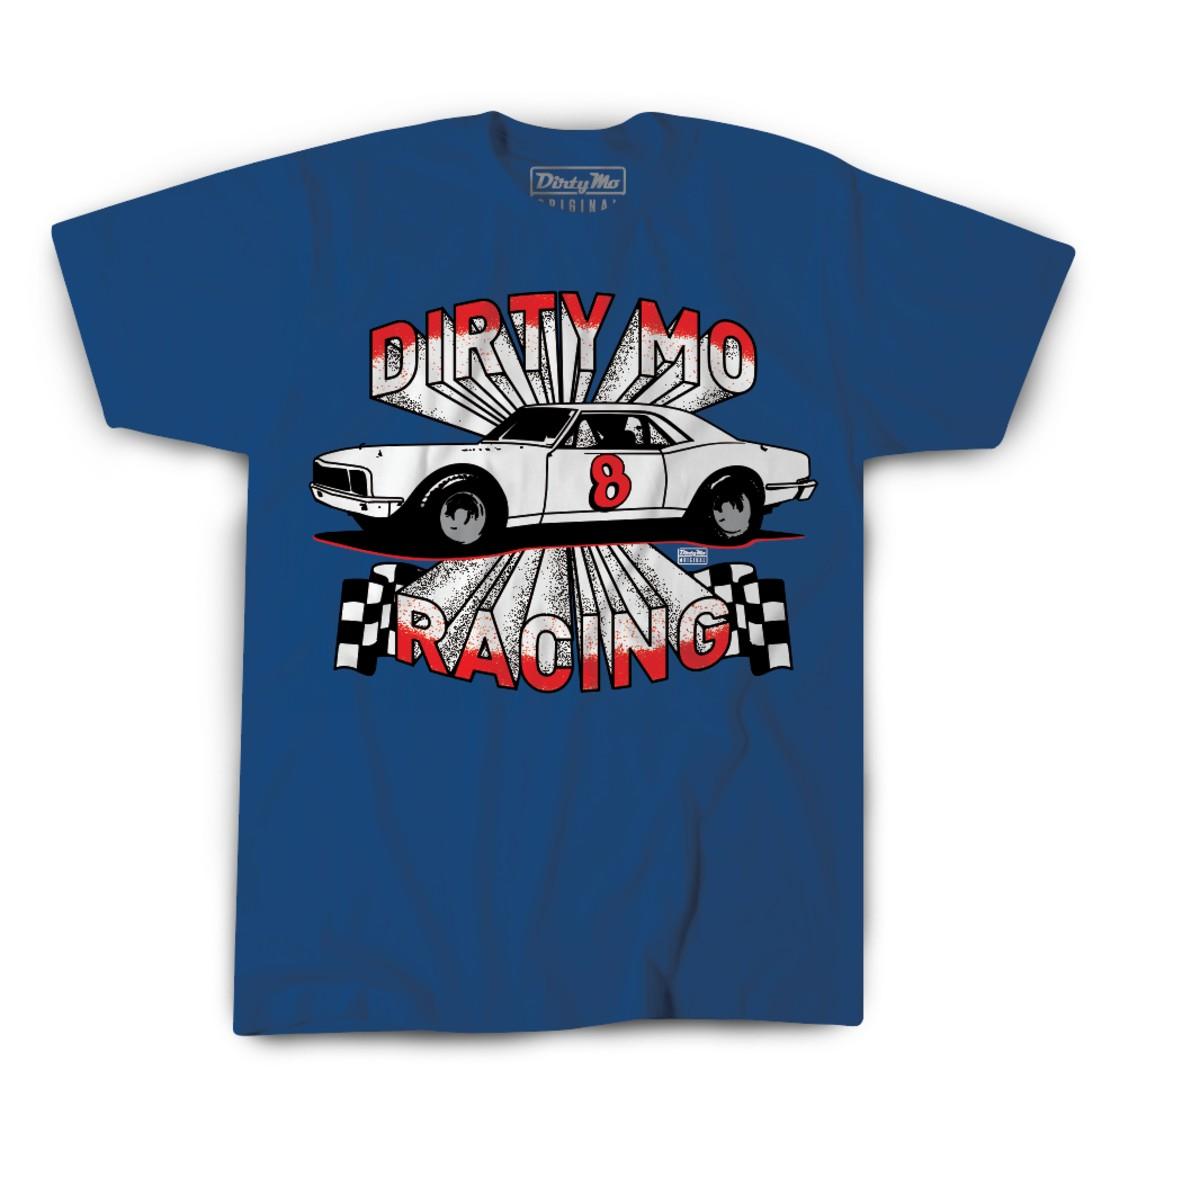 Dirty Mo Media Racing T-shirt